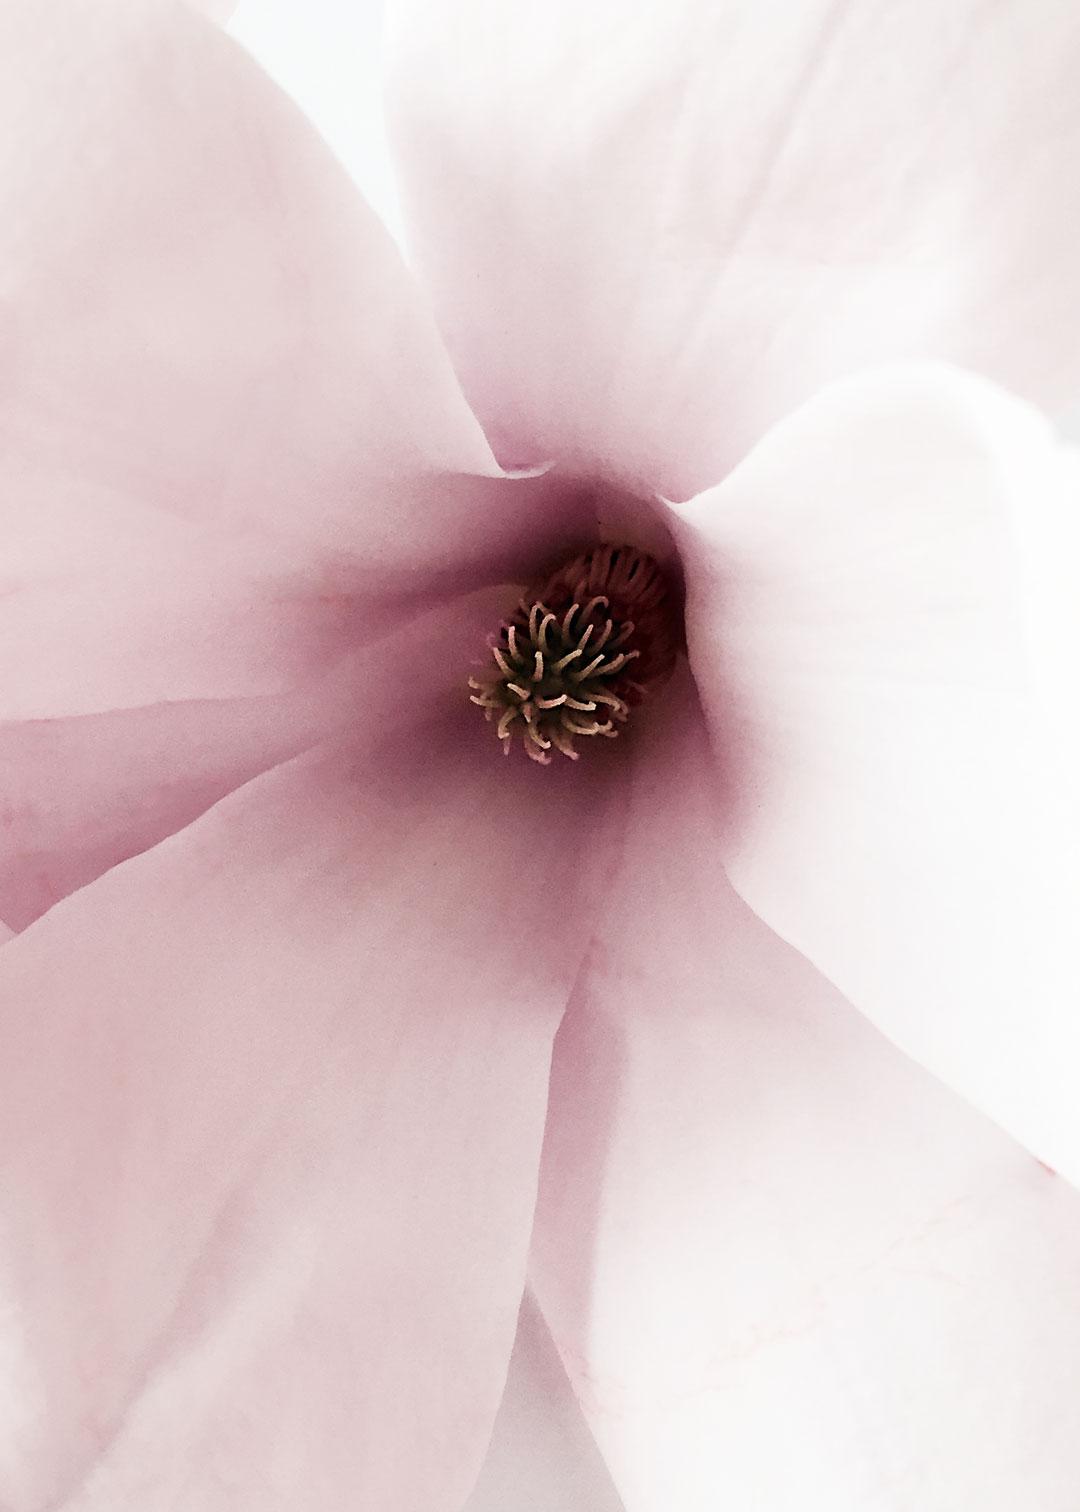 Insta_floral_study_1c